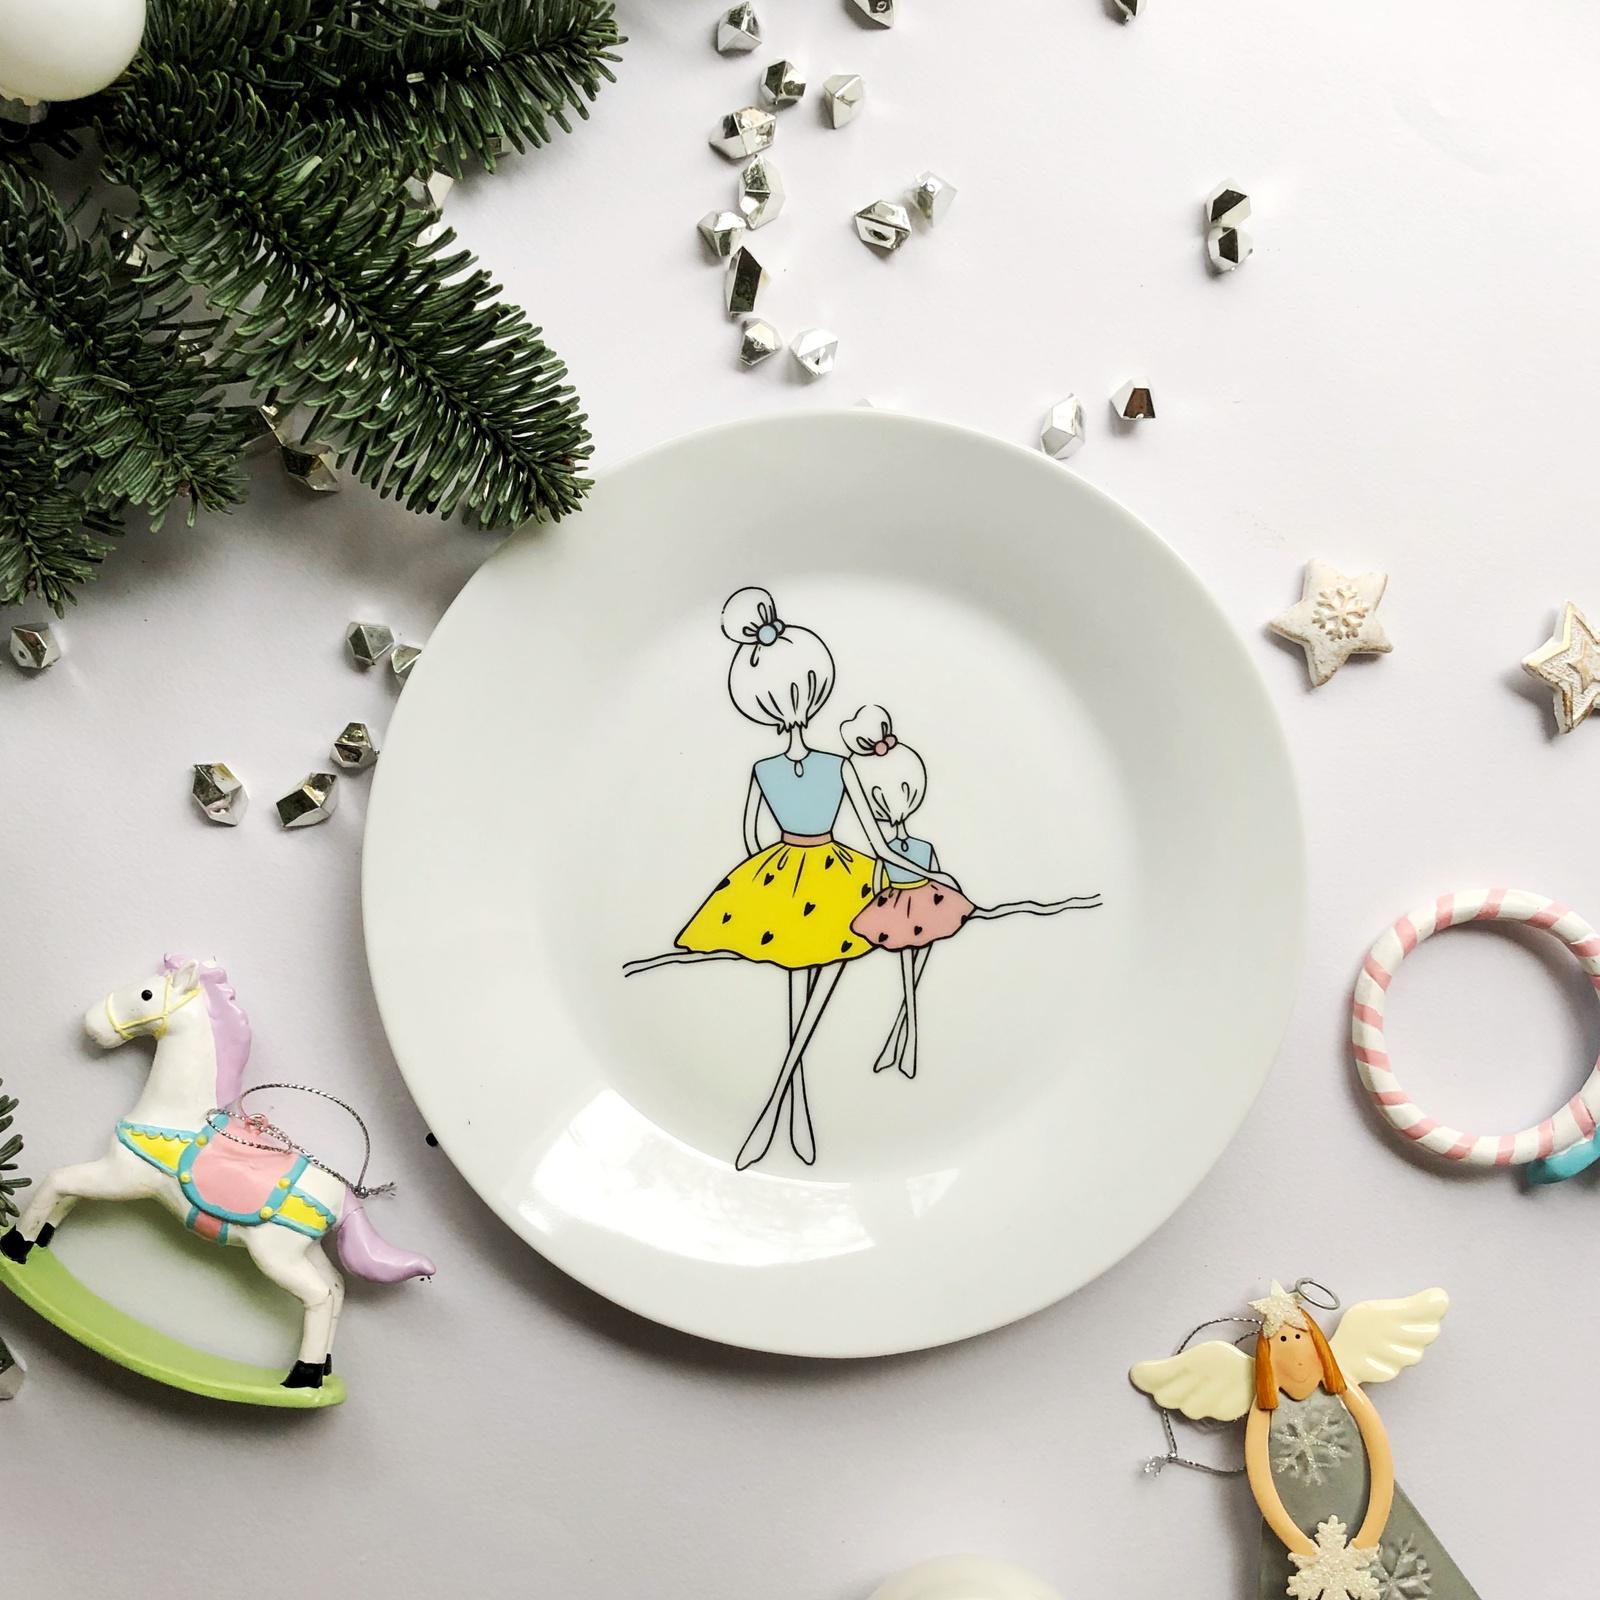 Тарелка Сотвори Чудо Мама 20 см, белый тарелка мелкая сотвори чудо воздушный город диаметр 20 см